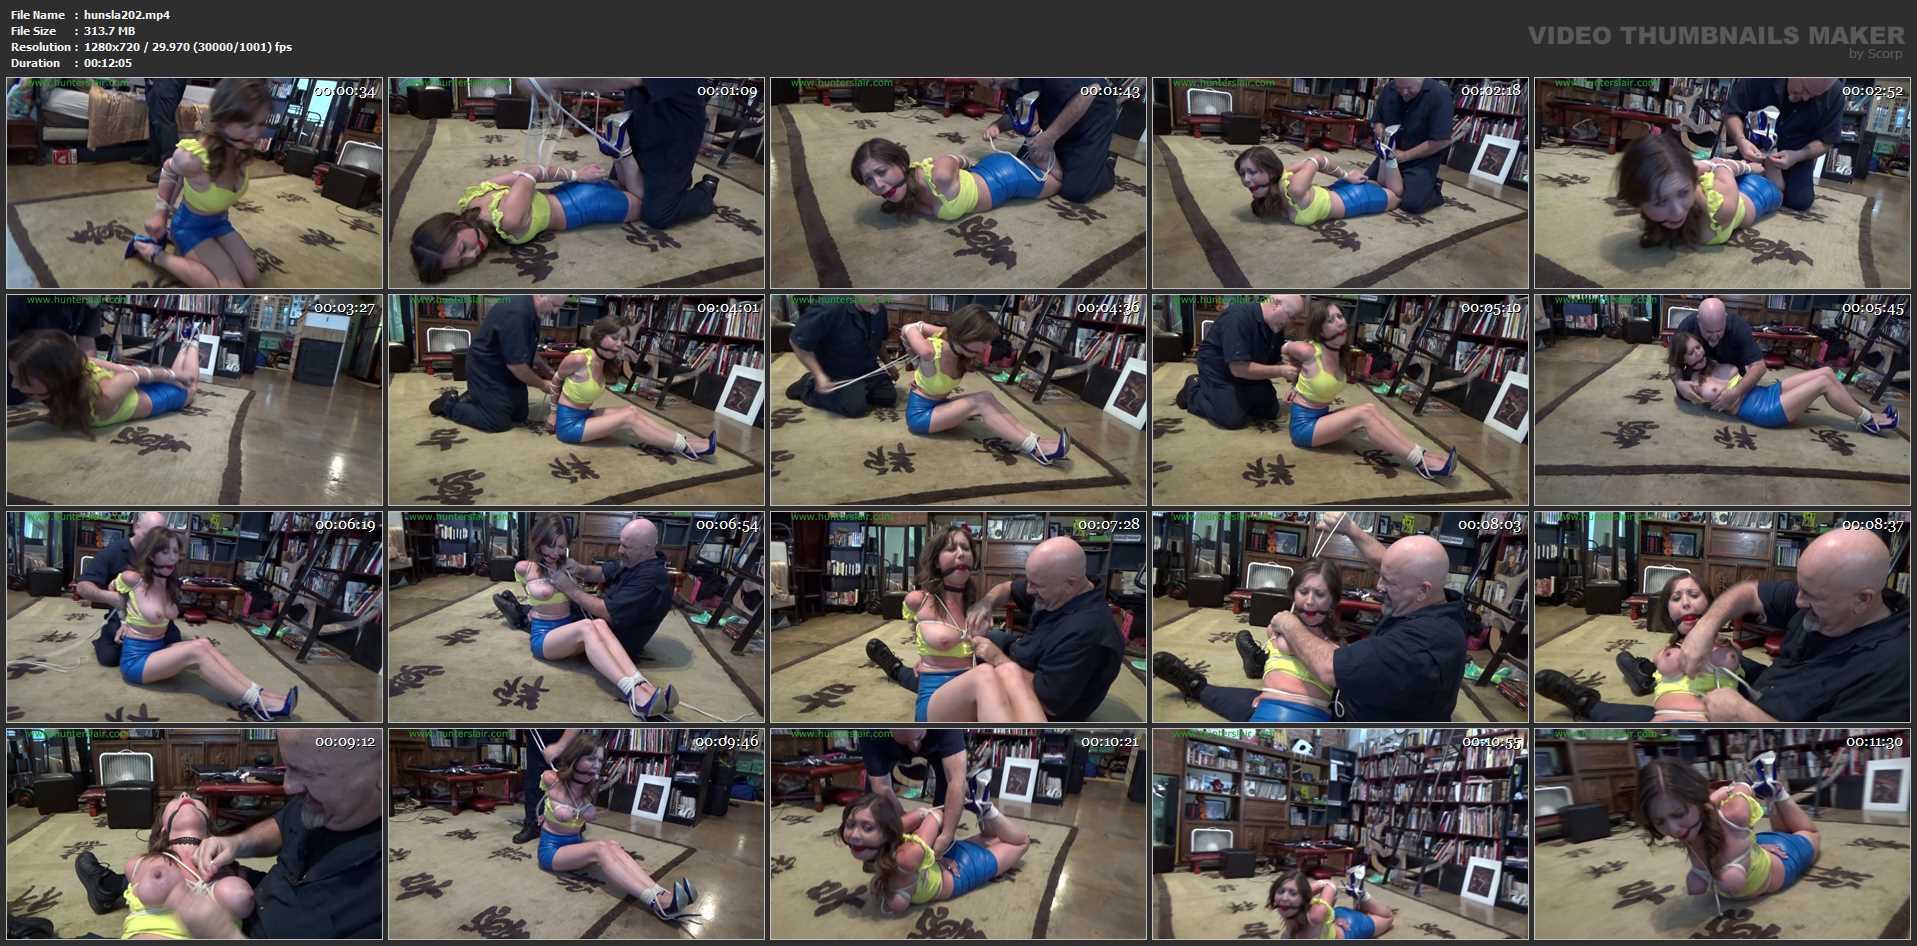 [HUNTERSLAIR] Cruel breast bound chicken wing hogtie. Featuring: Chrissy Marie [HD][720p][MP4]